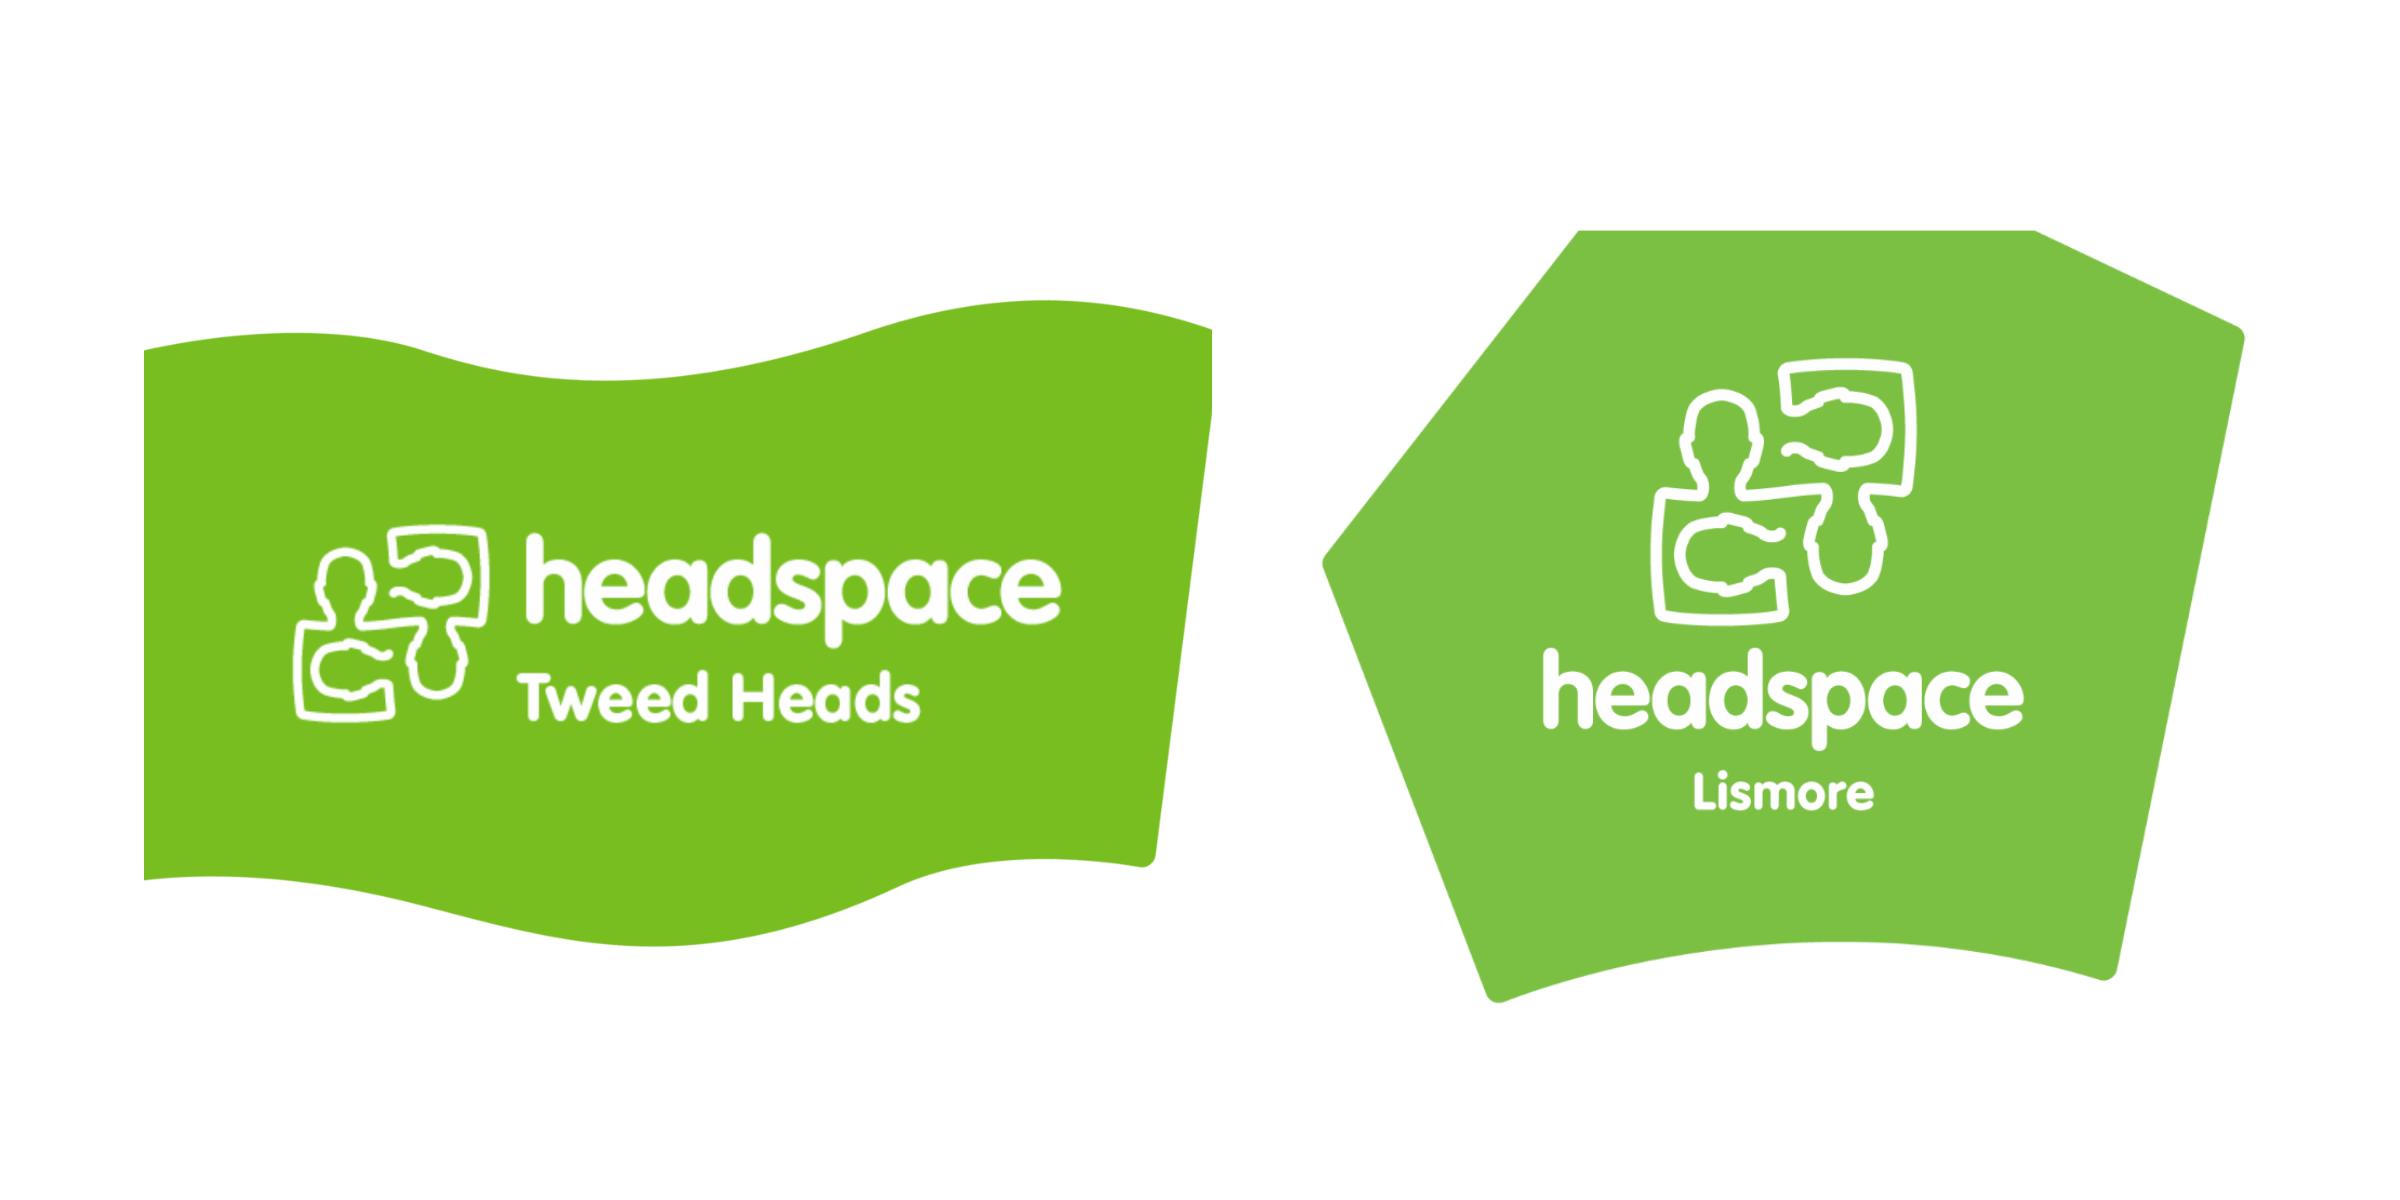 headspace Tweed Heads logo